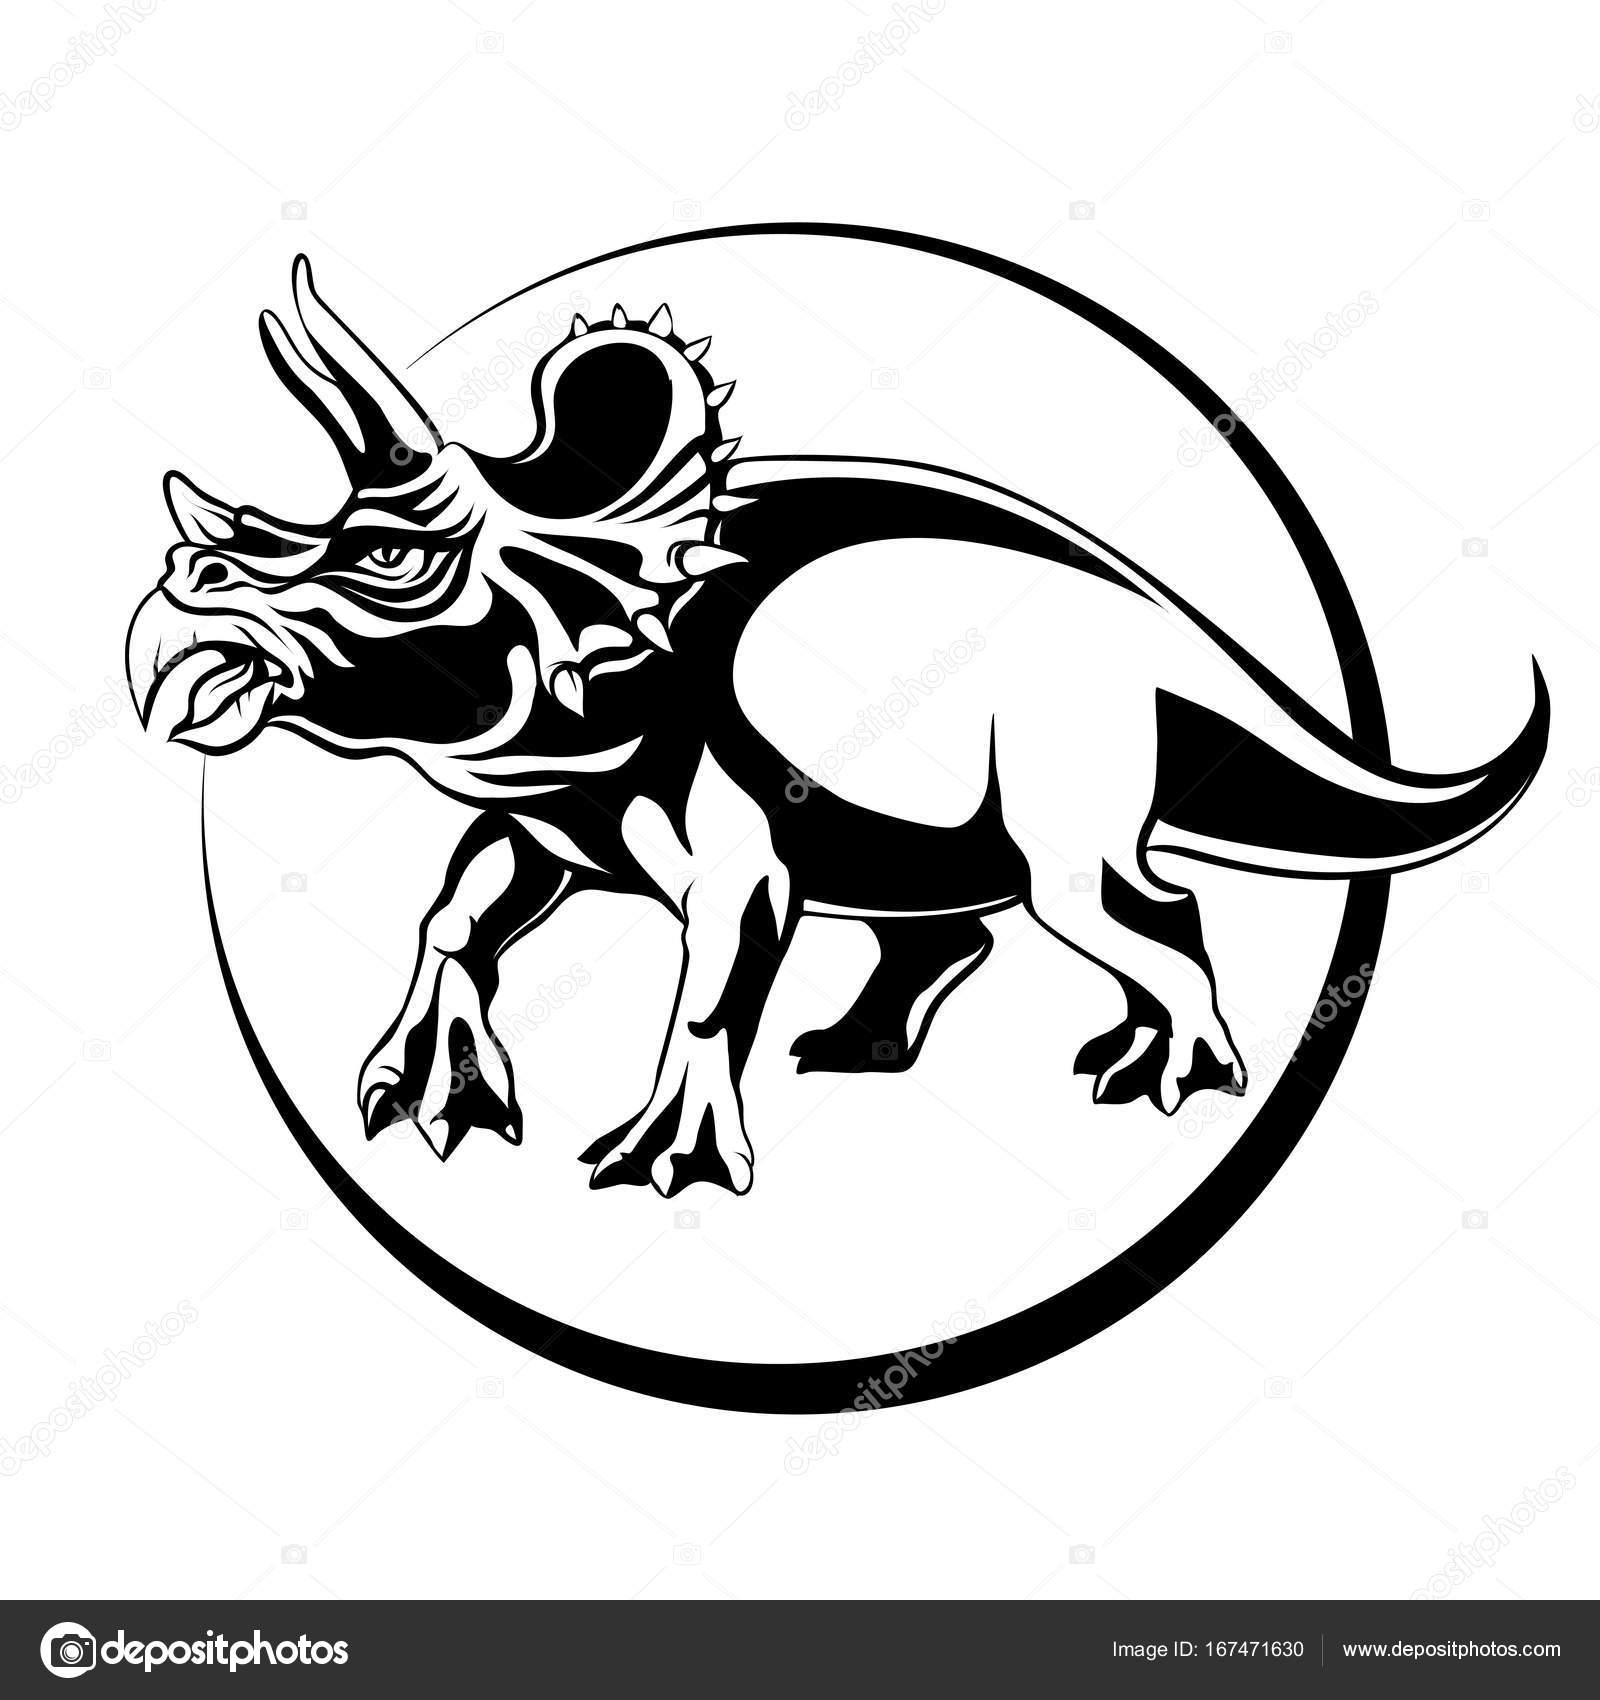 1600x1700 Silhouette Sketch Herbivorous Dinosaur Triceratops With Horns